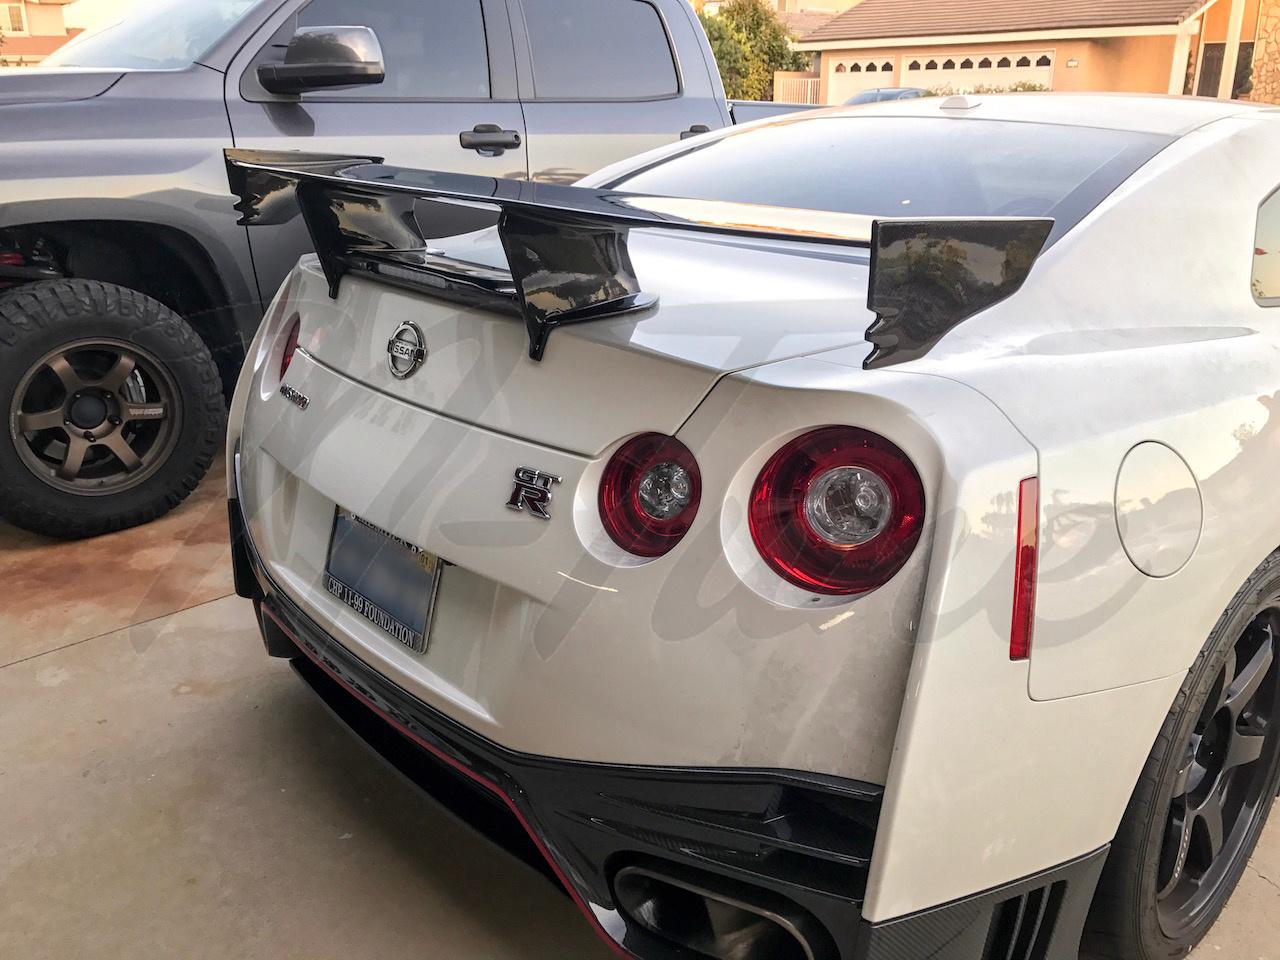 N Tune Rear Wing Carbon Fiber 2009 2017 Nissan R35 Gtr